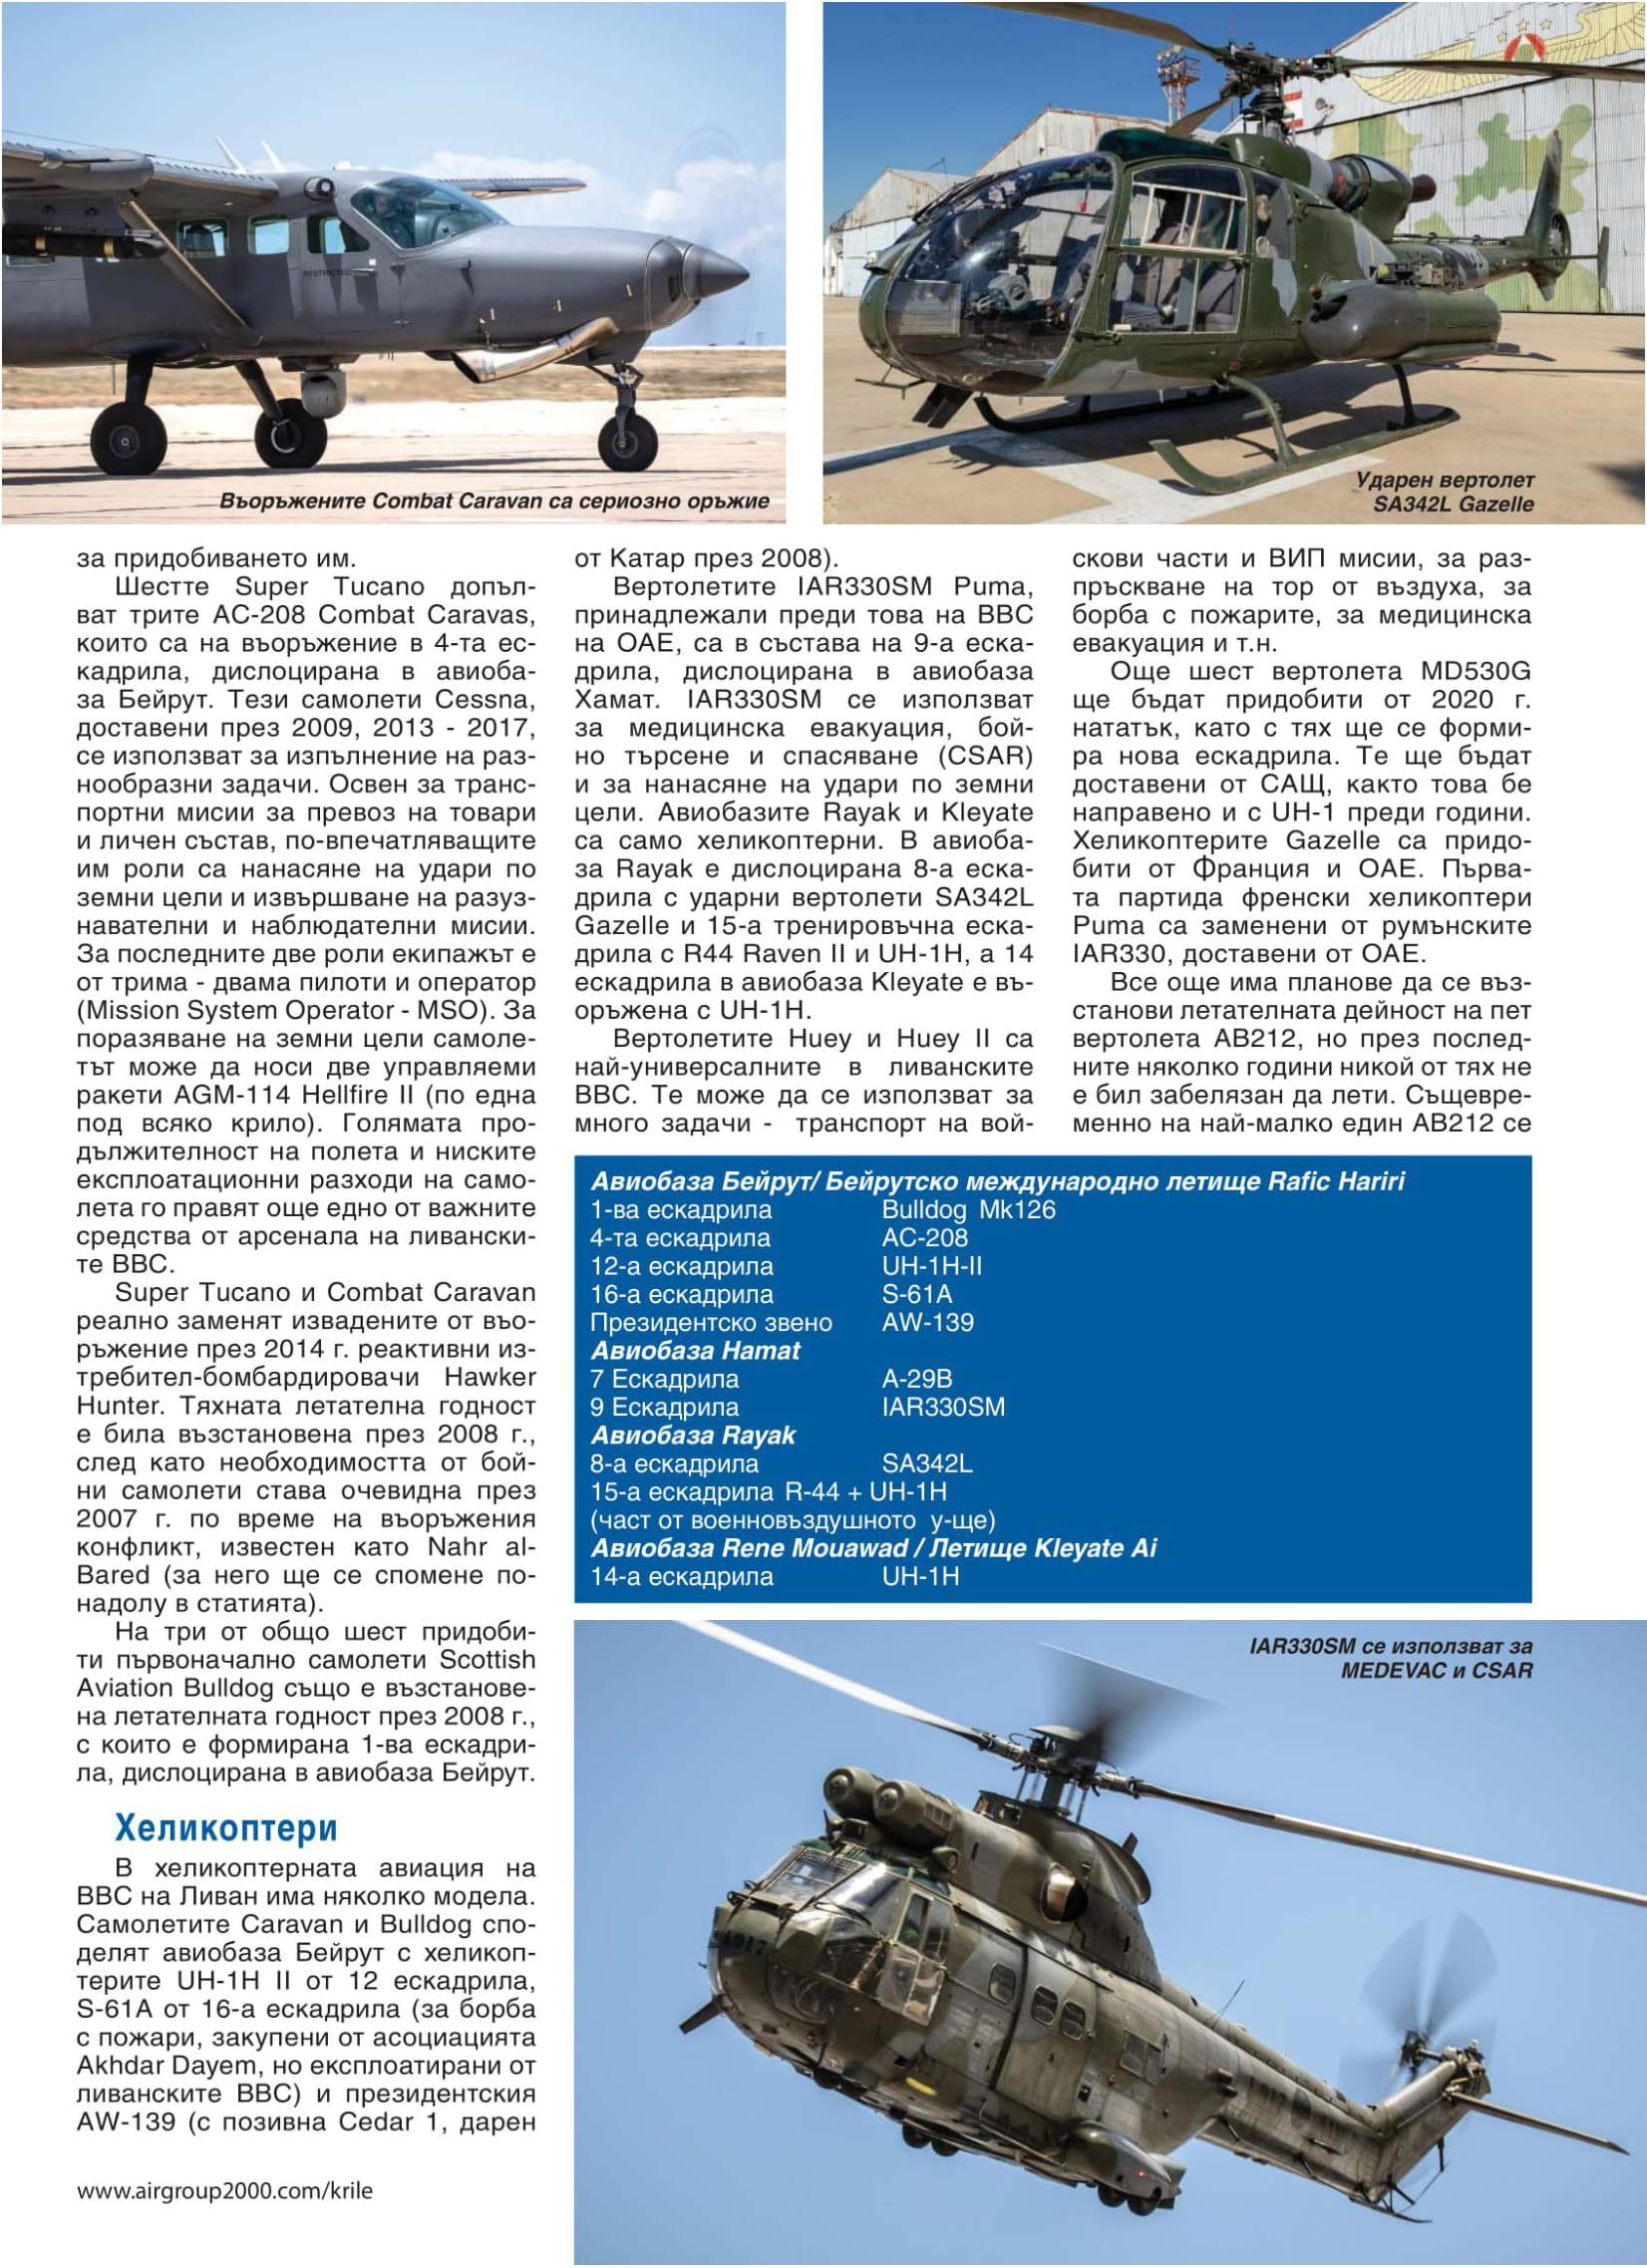 Club Wings (Bulgaria)_Lebanese Air Force (part 1)-3